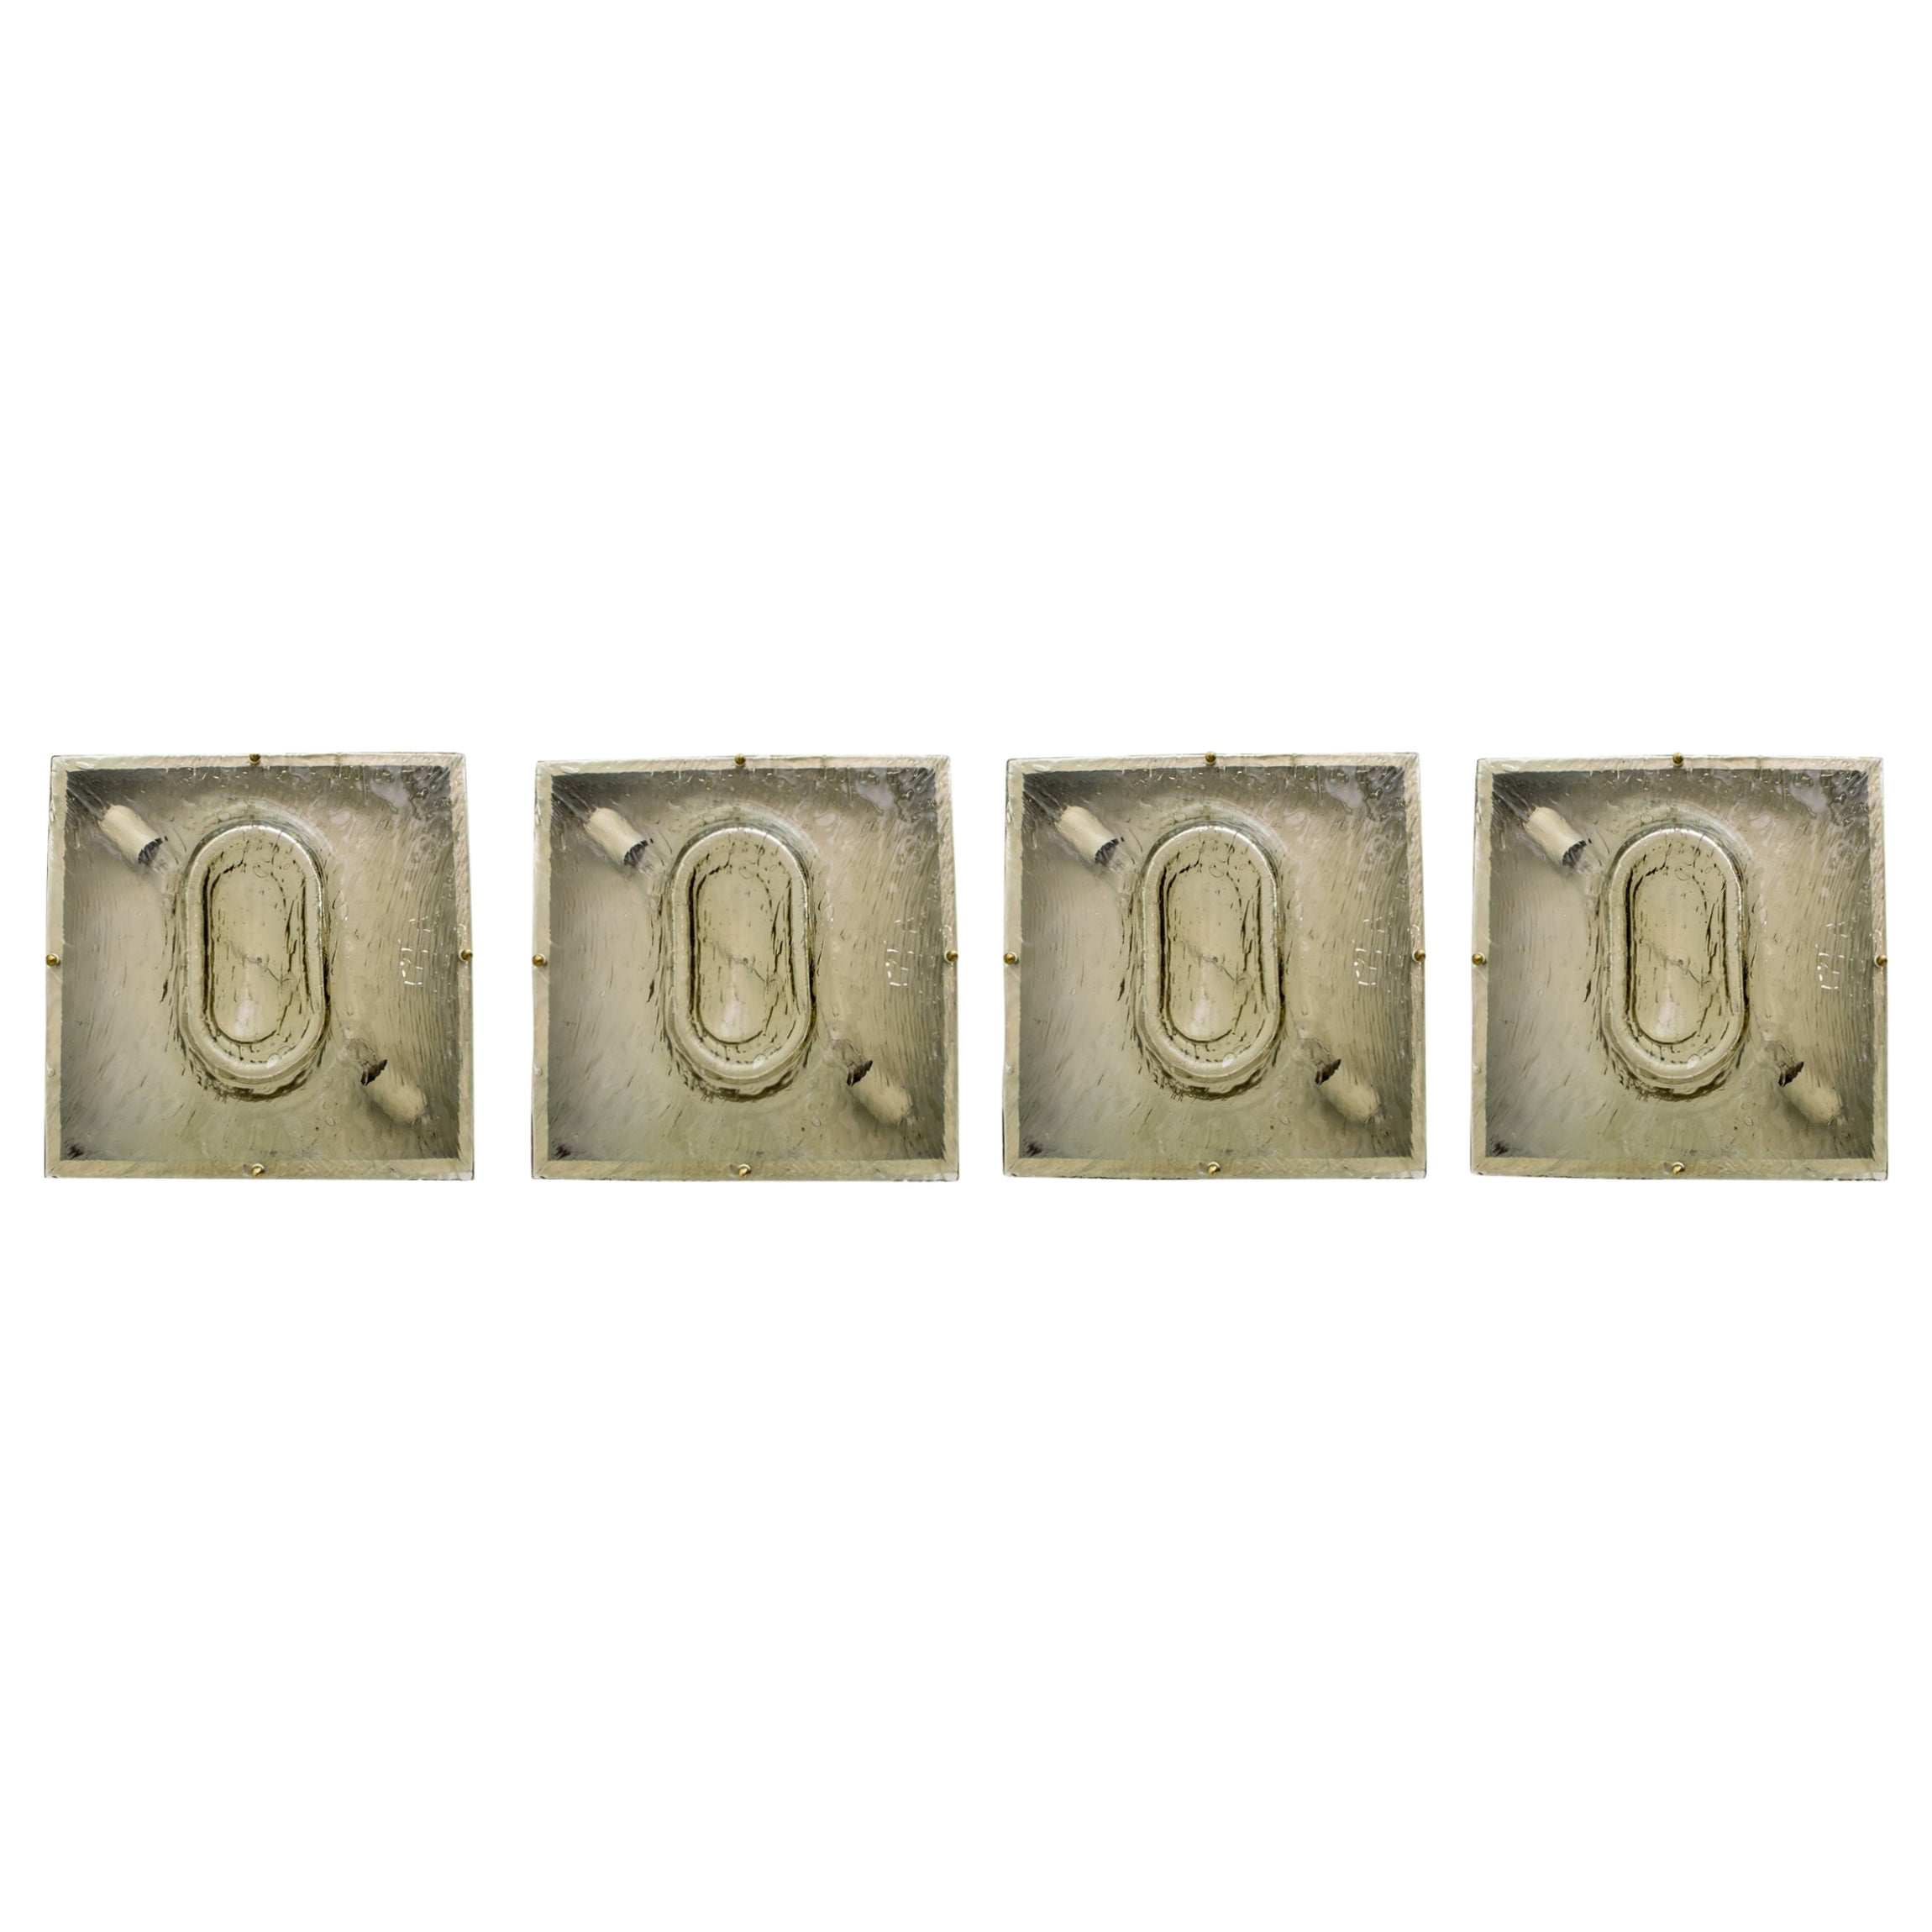 Four Toni Zuccheri Mid-Century Modern Murano Glass Sconces for Venini, 1960s